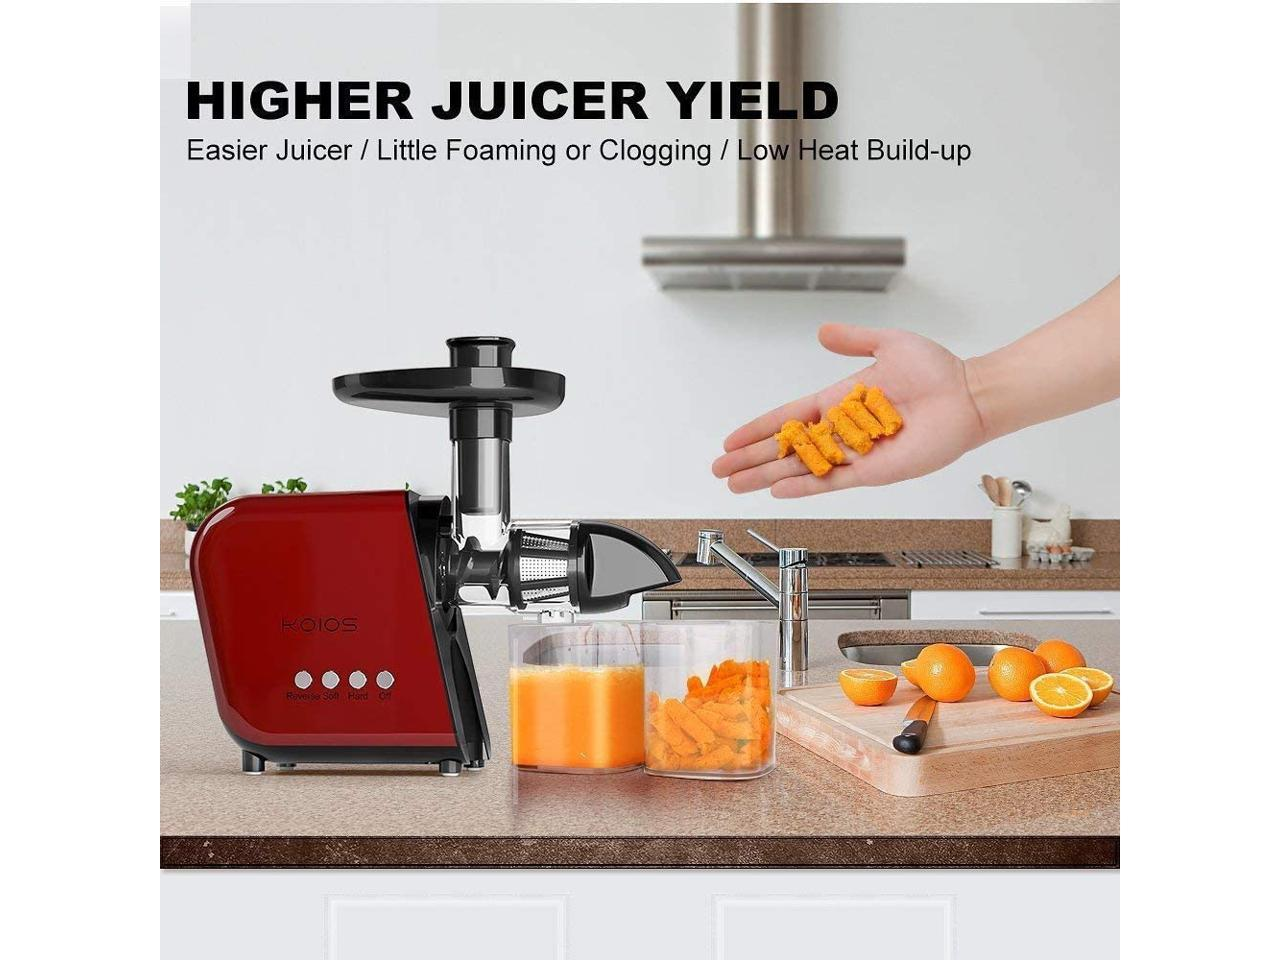 KOIOS Masticating Juicer Slow Juice Extractor Cold Press Fruit Quiet Motor B5100